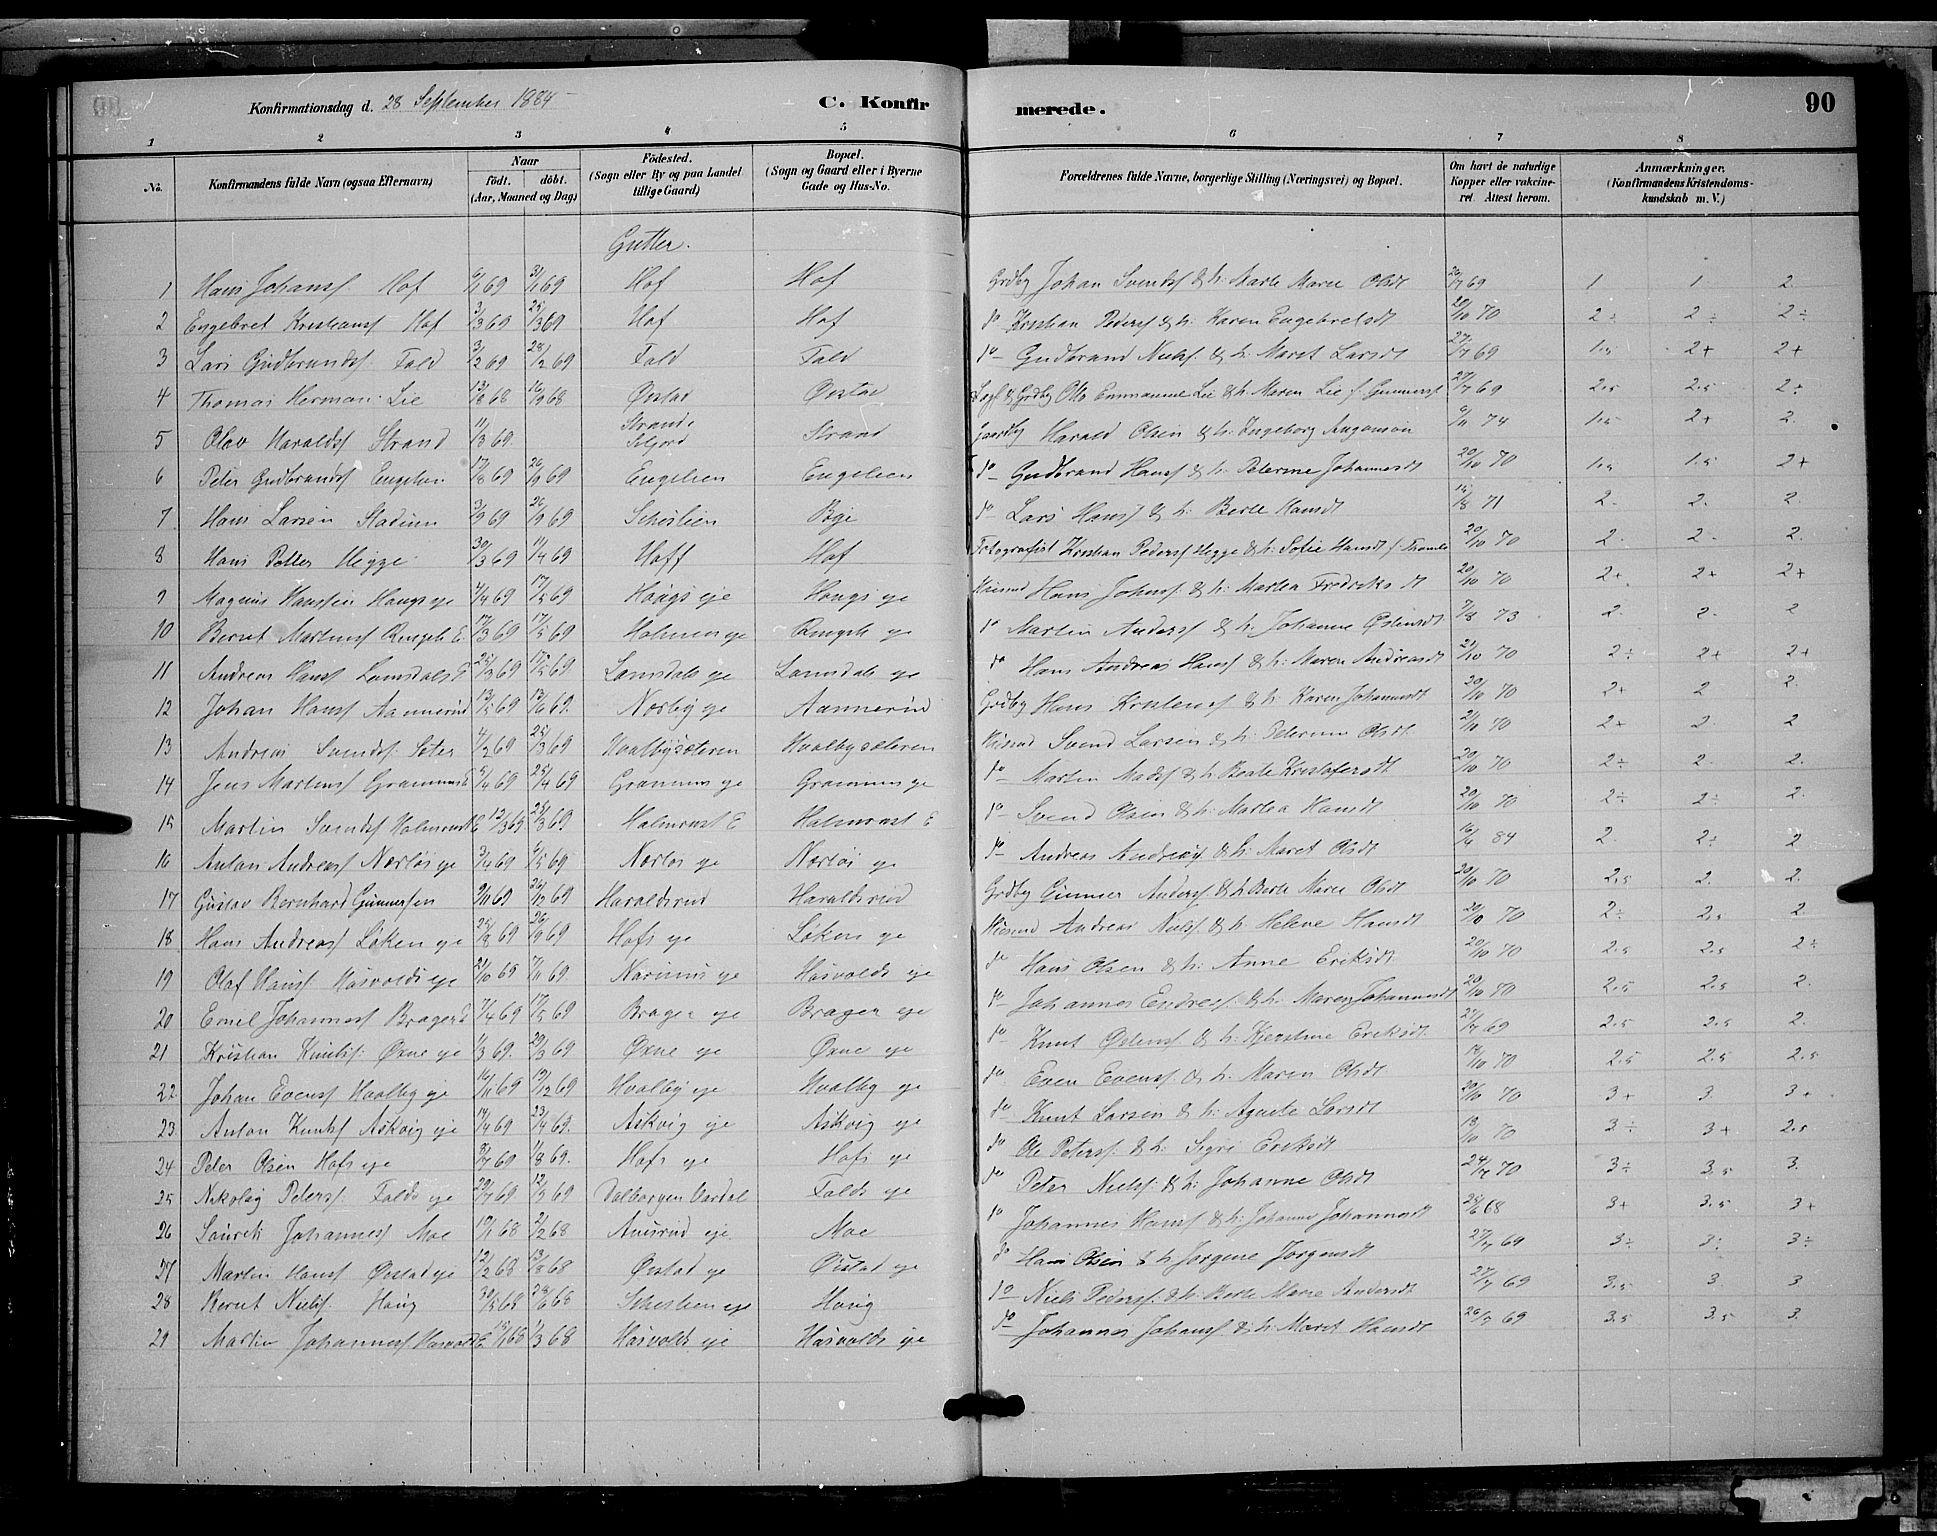 SAH, Søndre Land prestekontor, L/L0002: Klokkerbok nr. 2, 1884-1900, s. 90